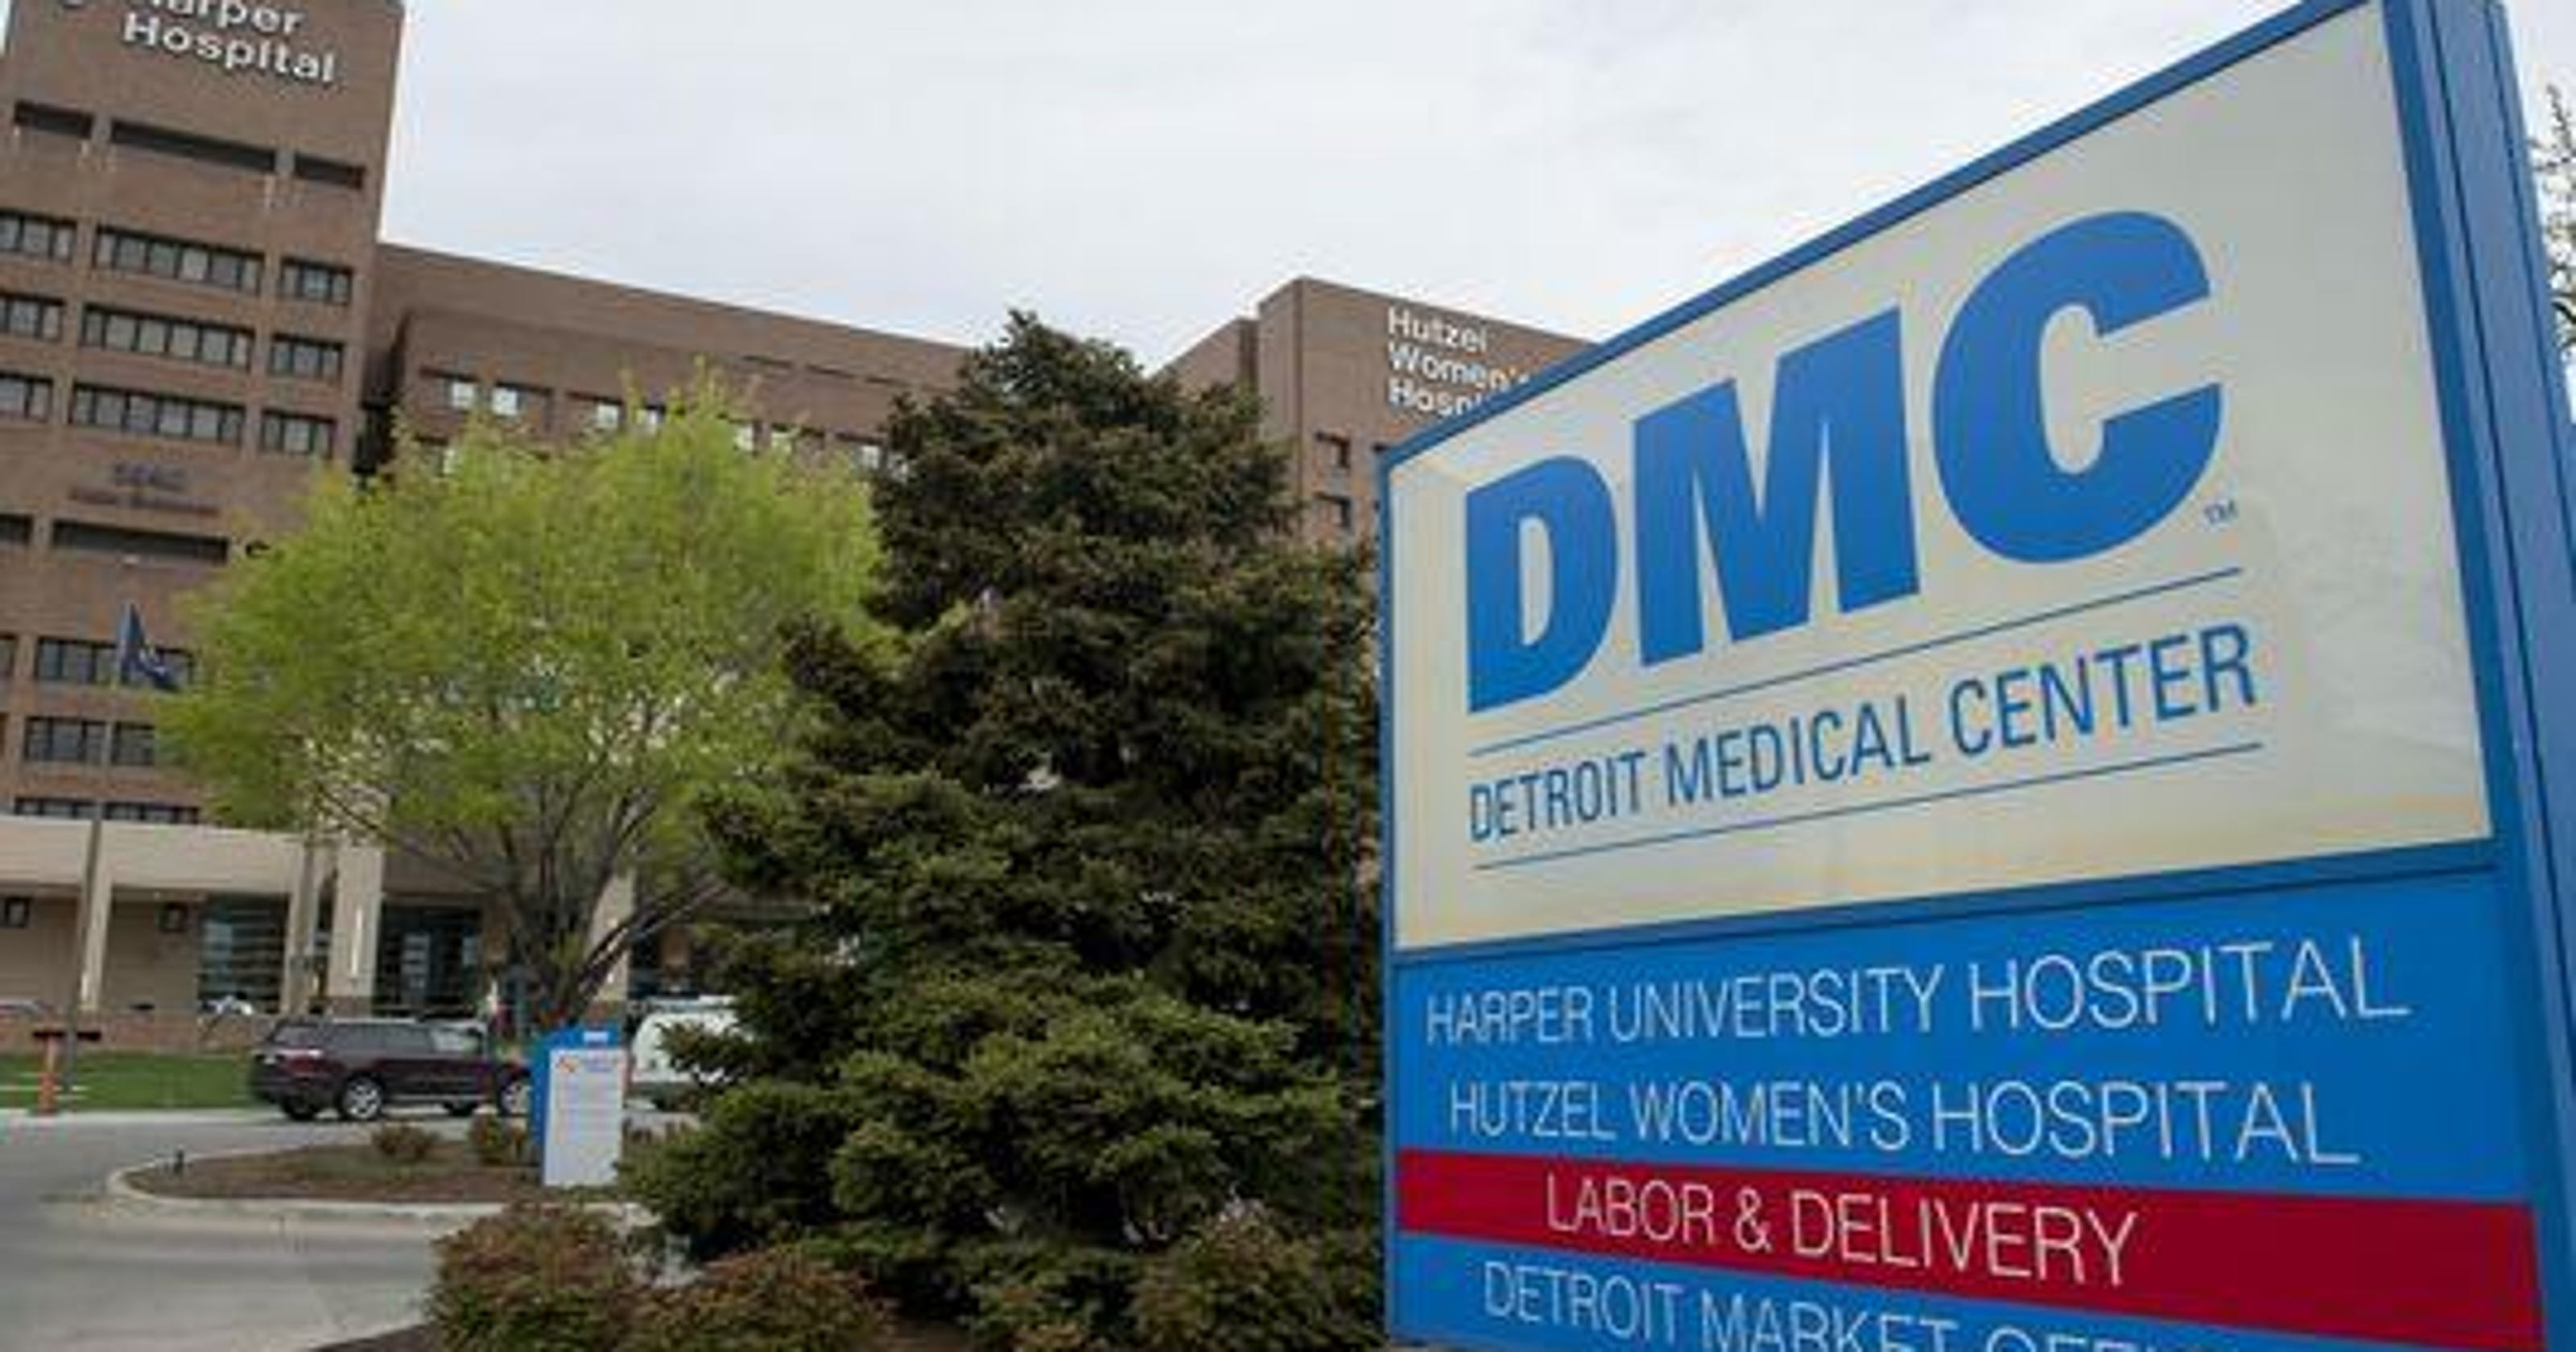 Dmc Hospital Downtown Detroit